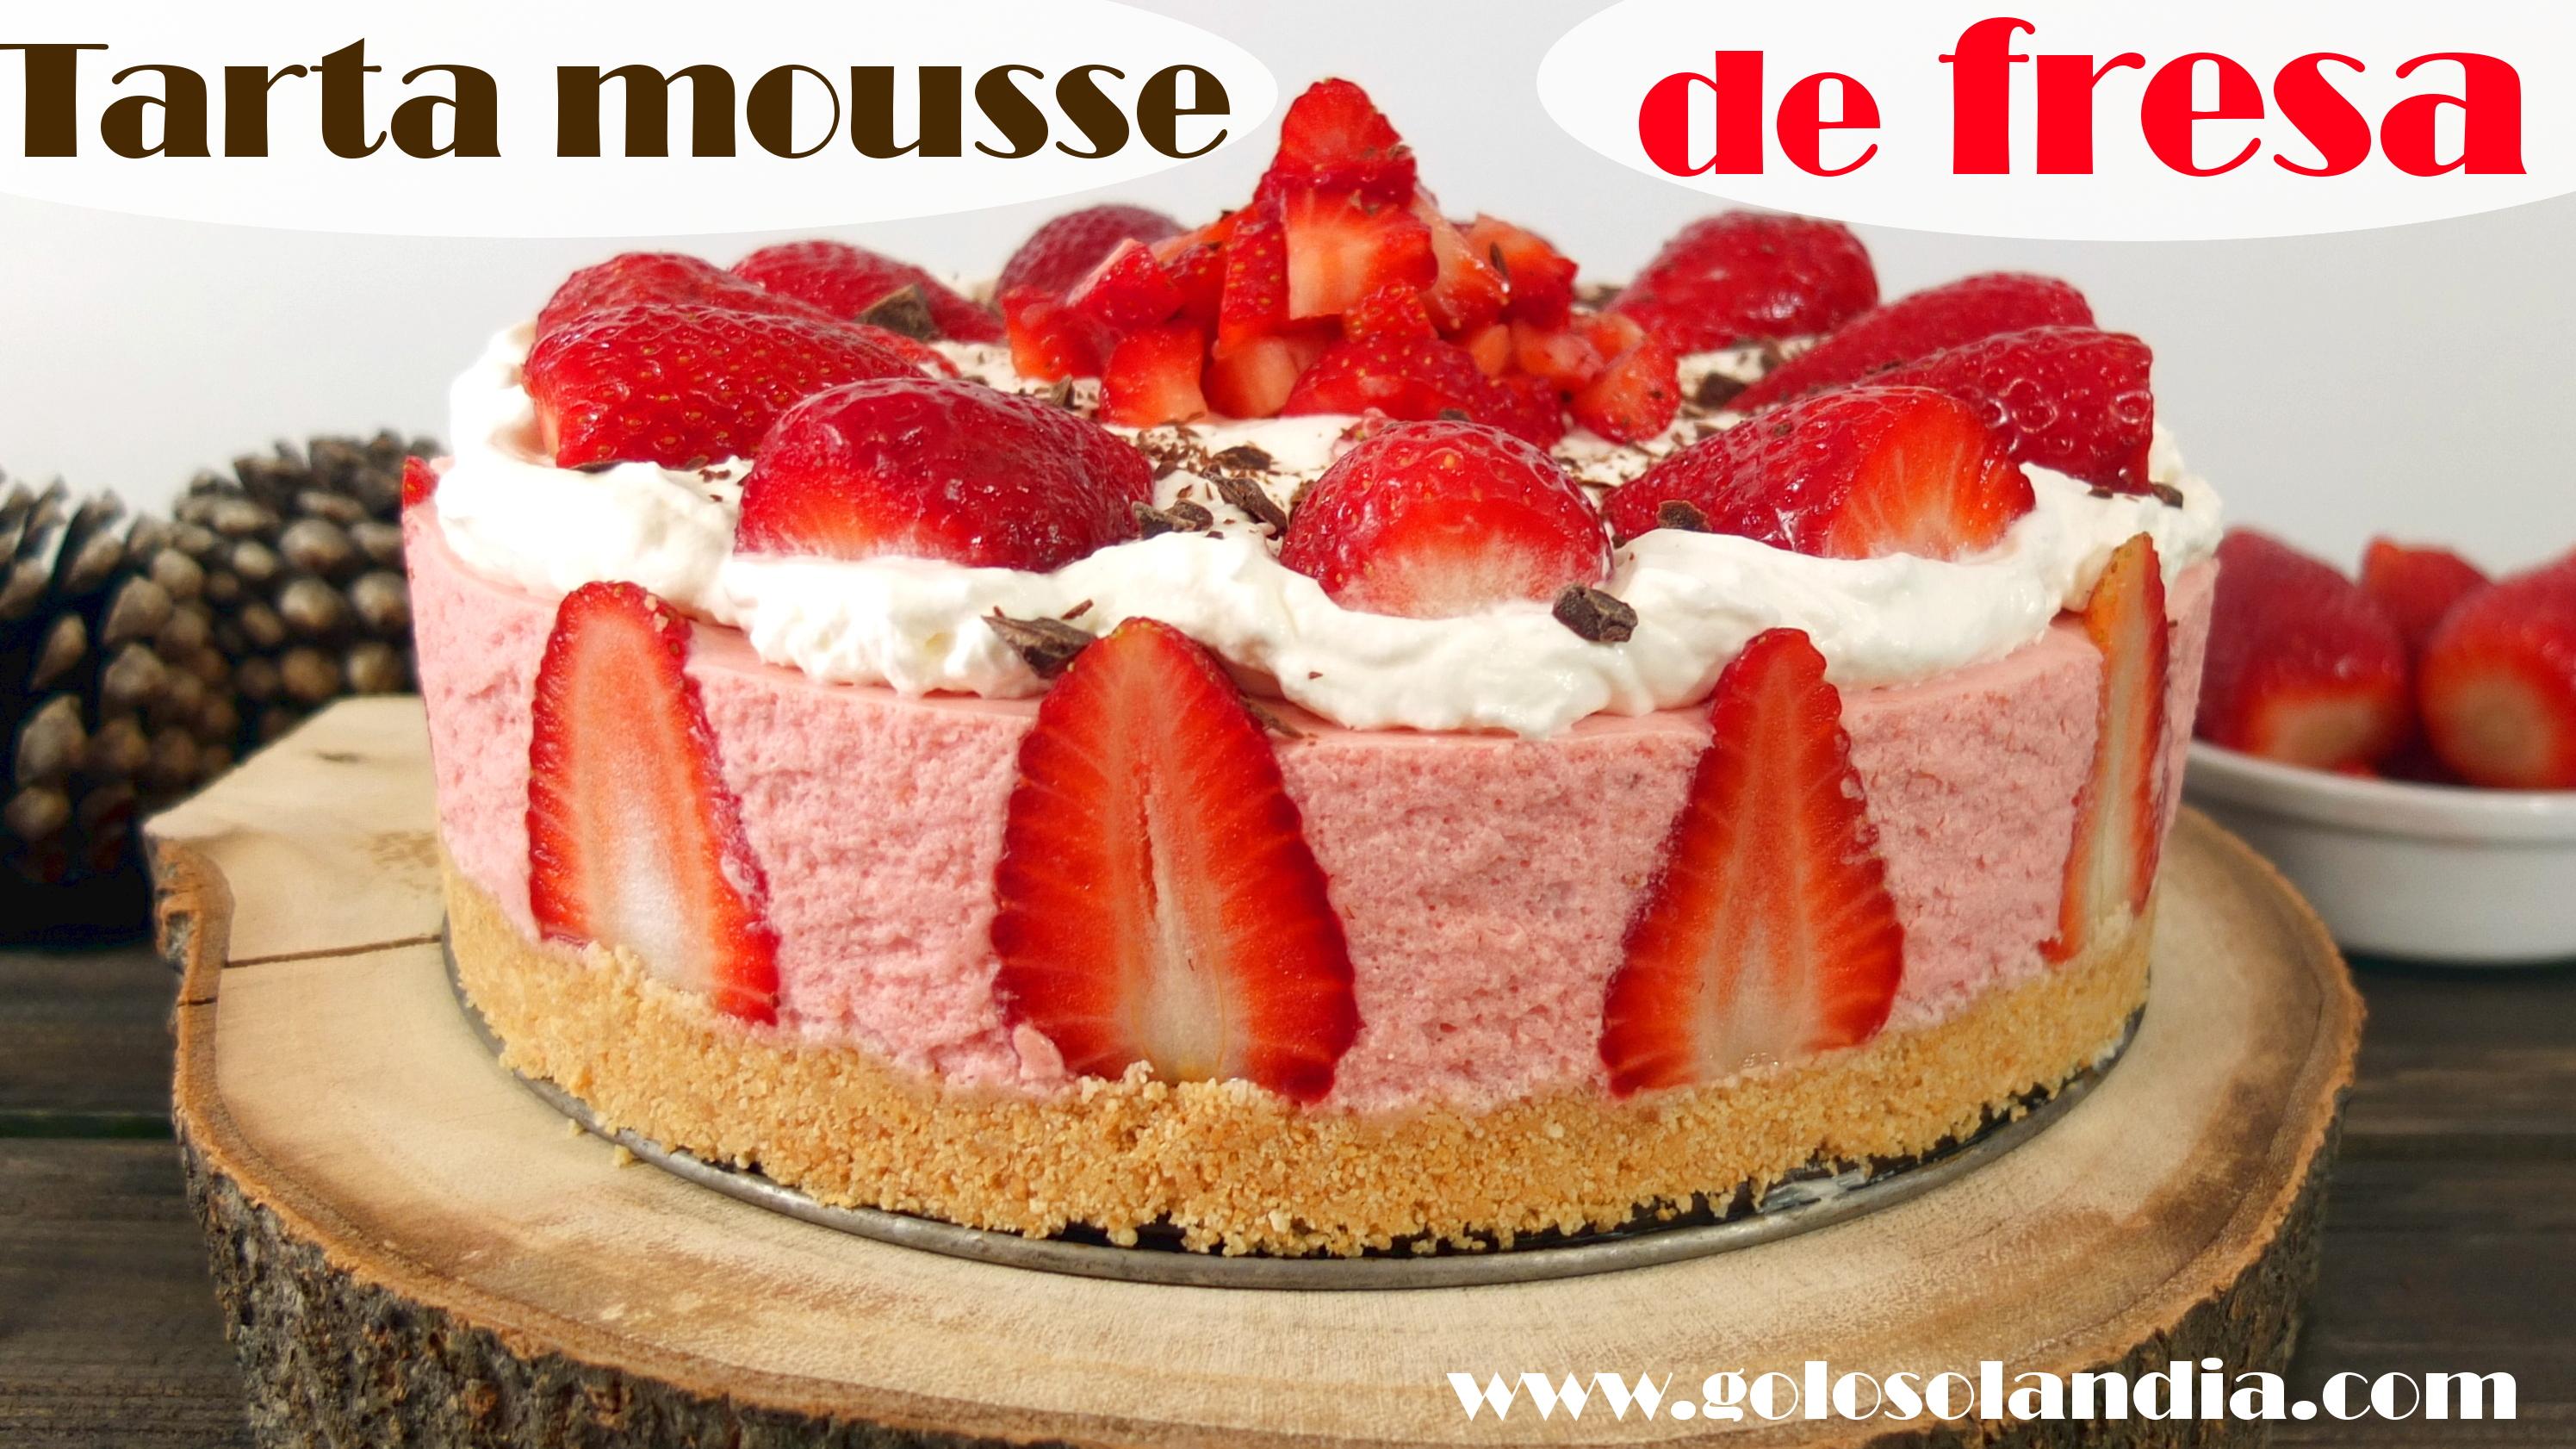 Tarta mousse de fresa receta escrita y v deo paso a paso - Mousse de fresa ...